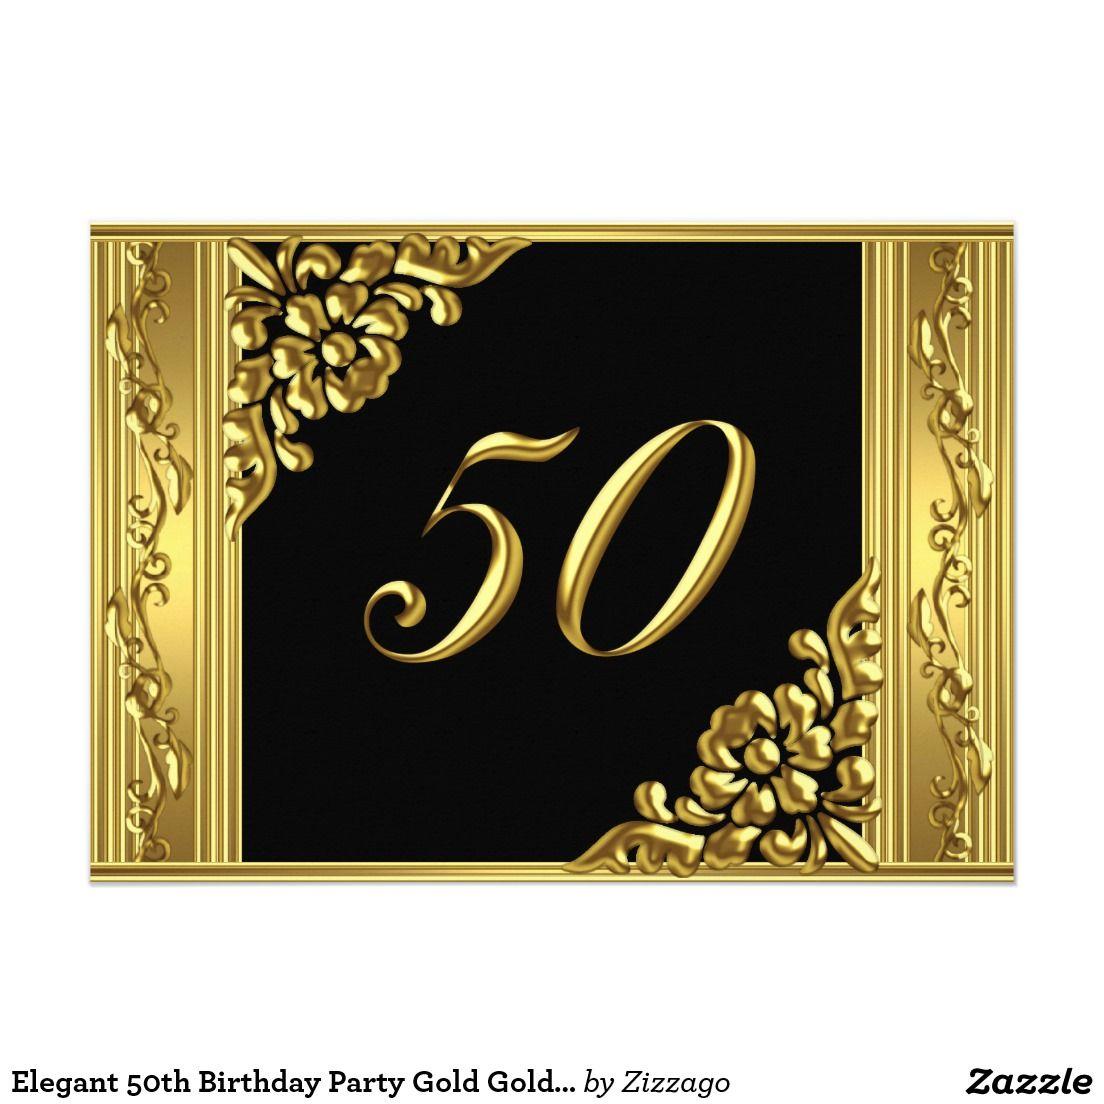 Elegant 50th Birthday Party Gold Golden 50 Black Card | 50 birthday ...